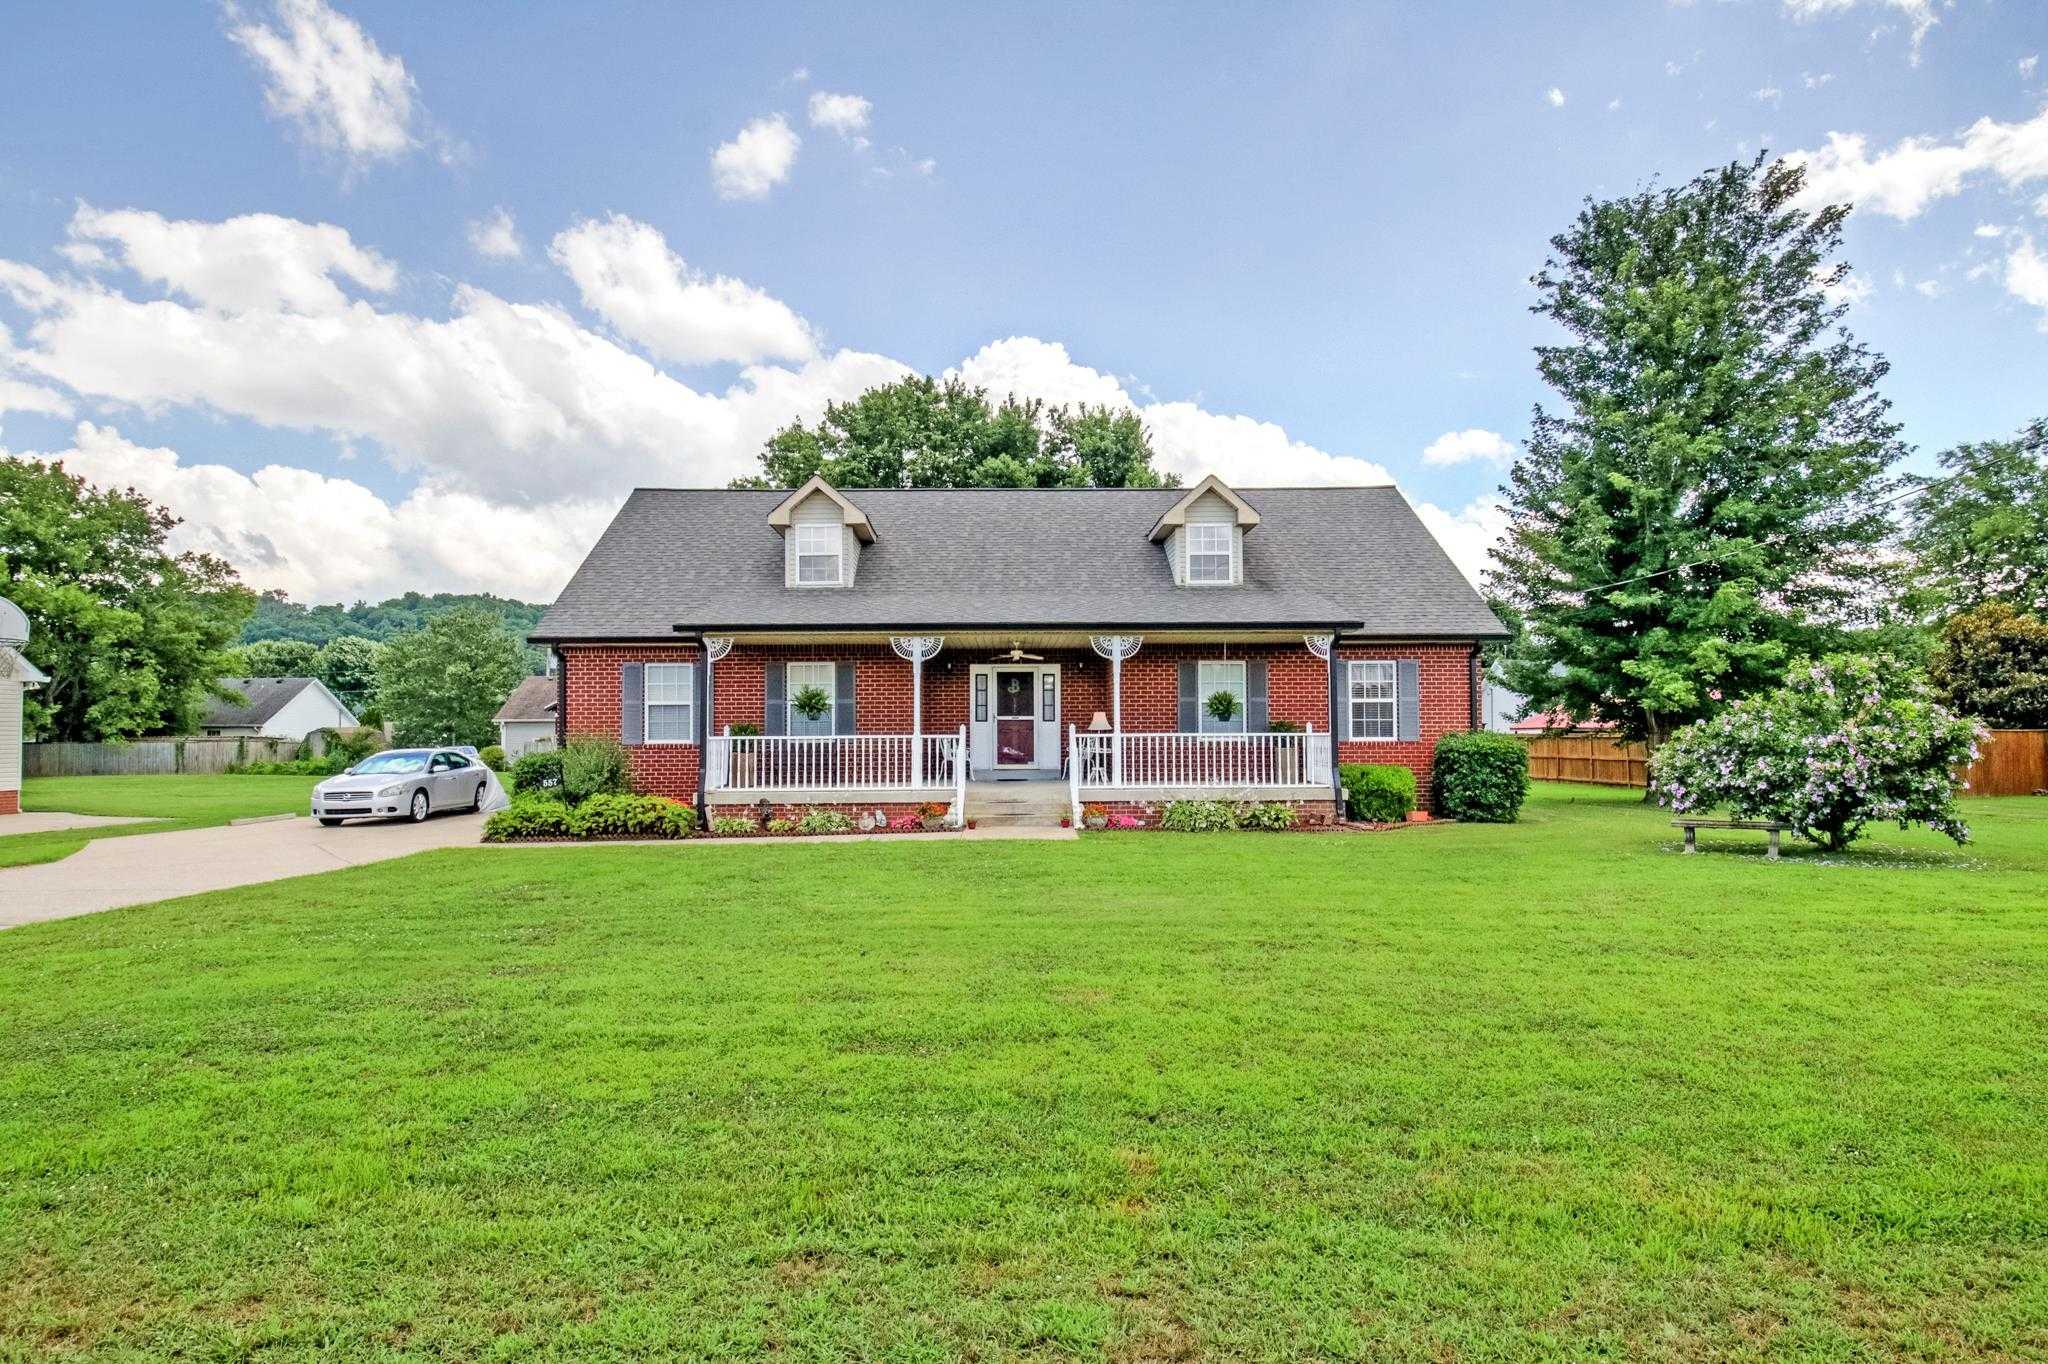 $338,000 - 3Br/3Ba -  for Sale in River Pointe Sec 2, Pegram